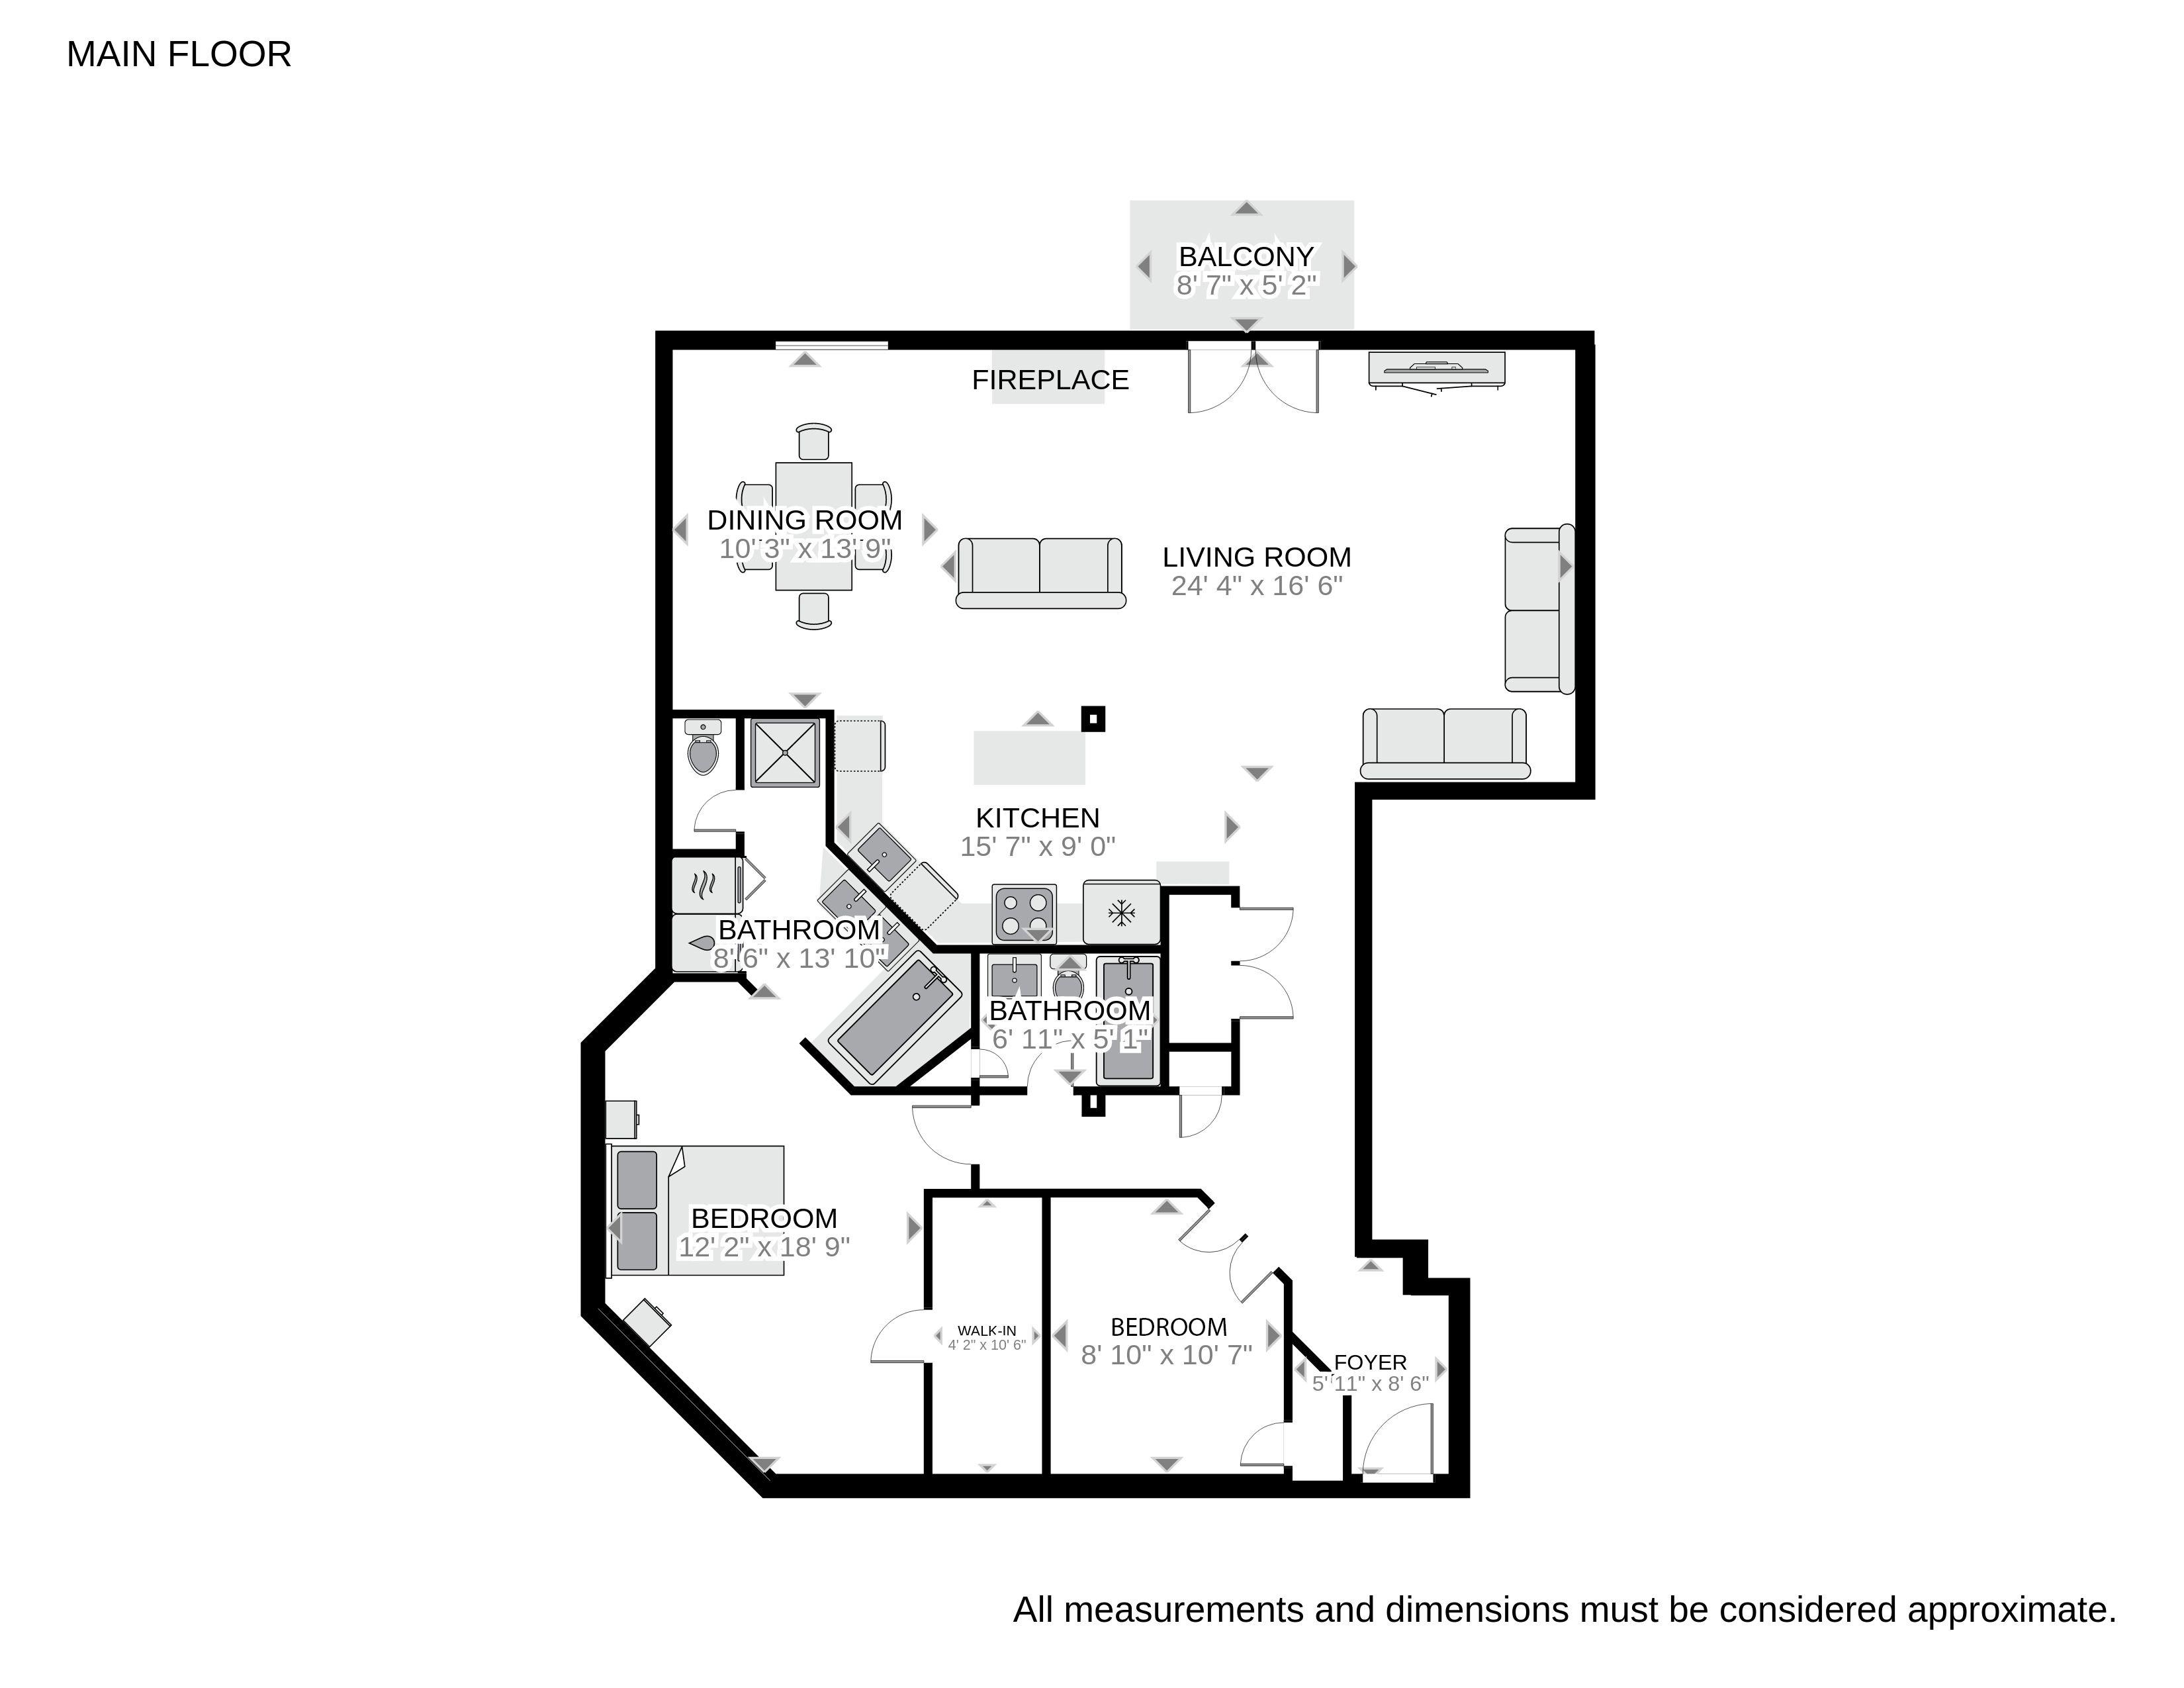 Floorplan for 1127 Auraria Pkwy Unit 404, Auraria Neighborhood, Denver